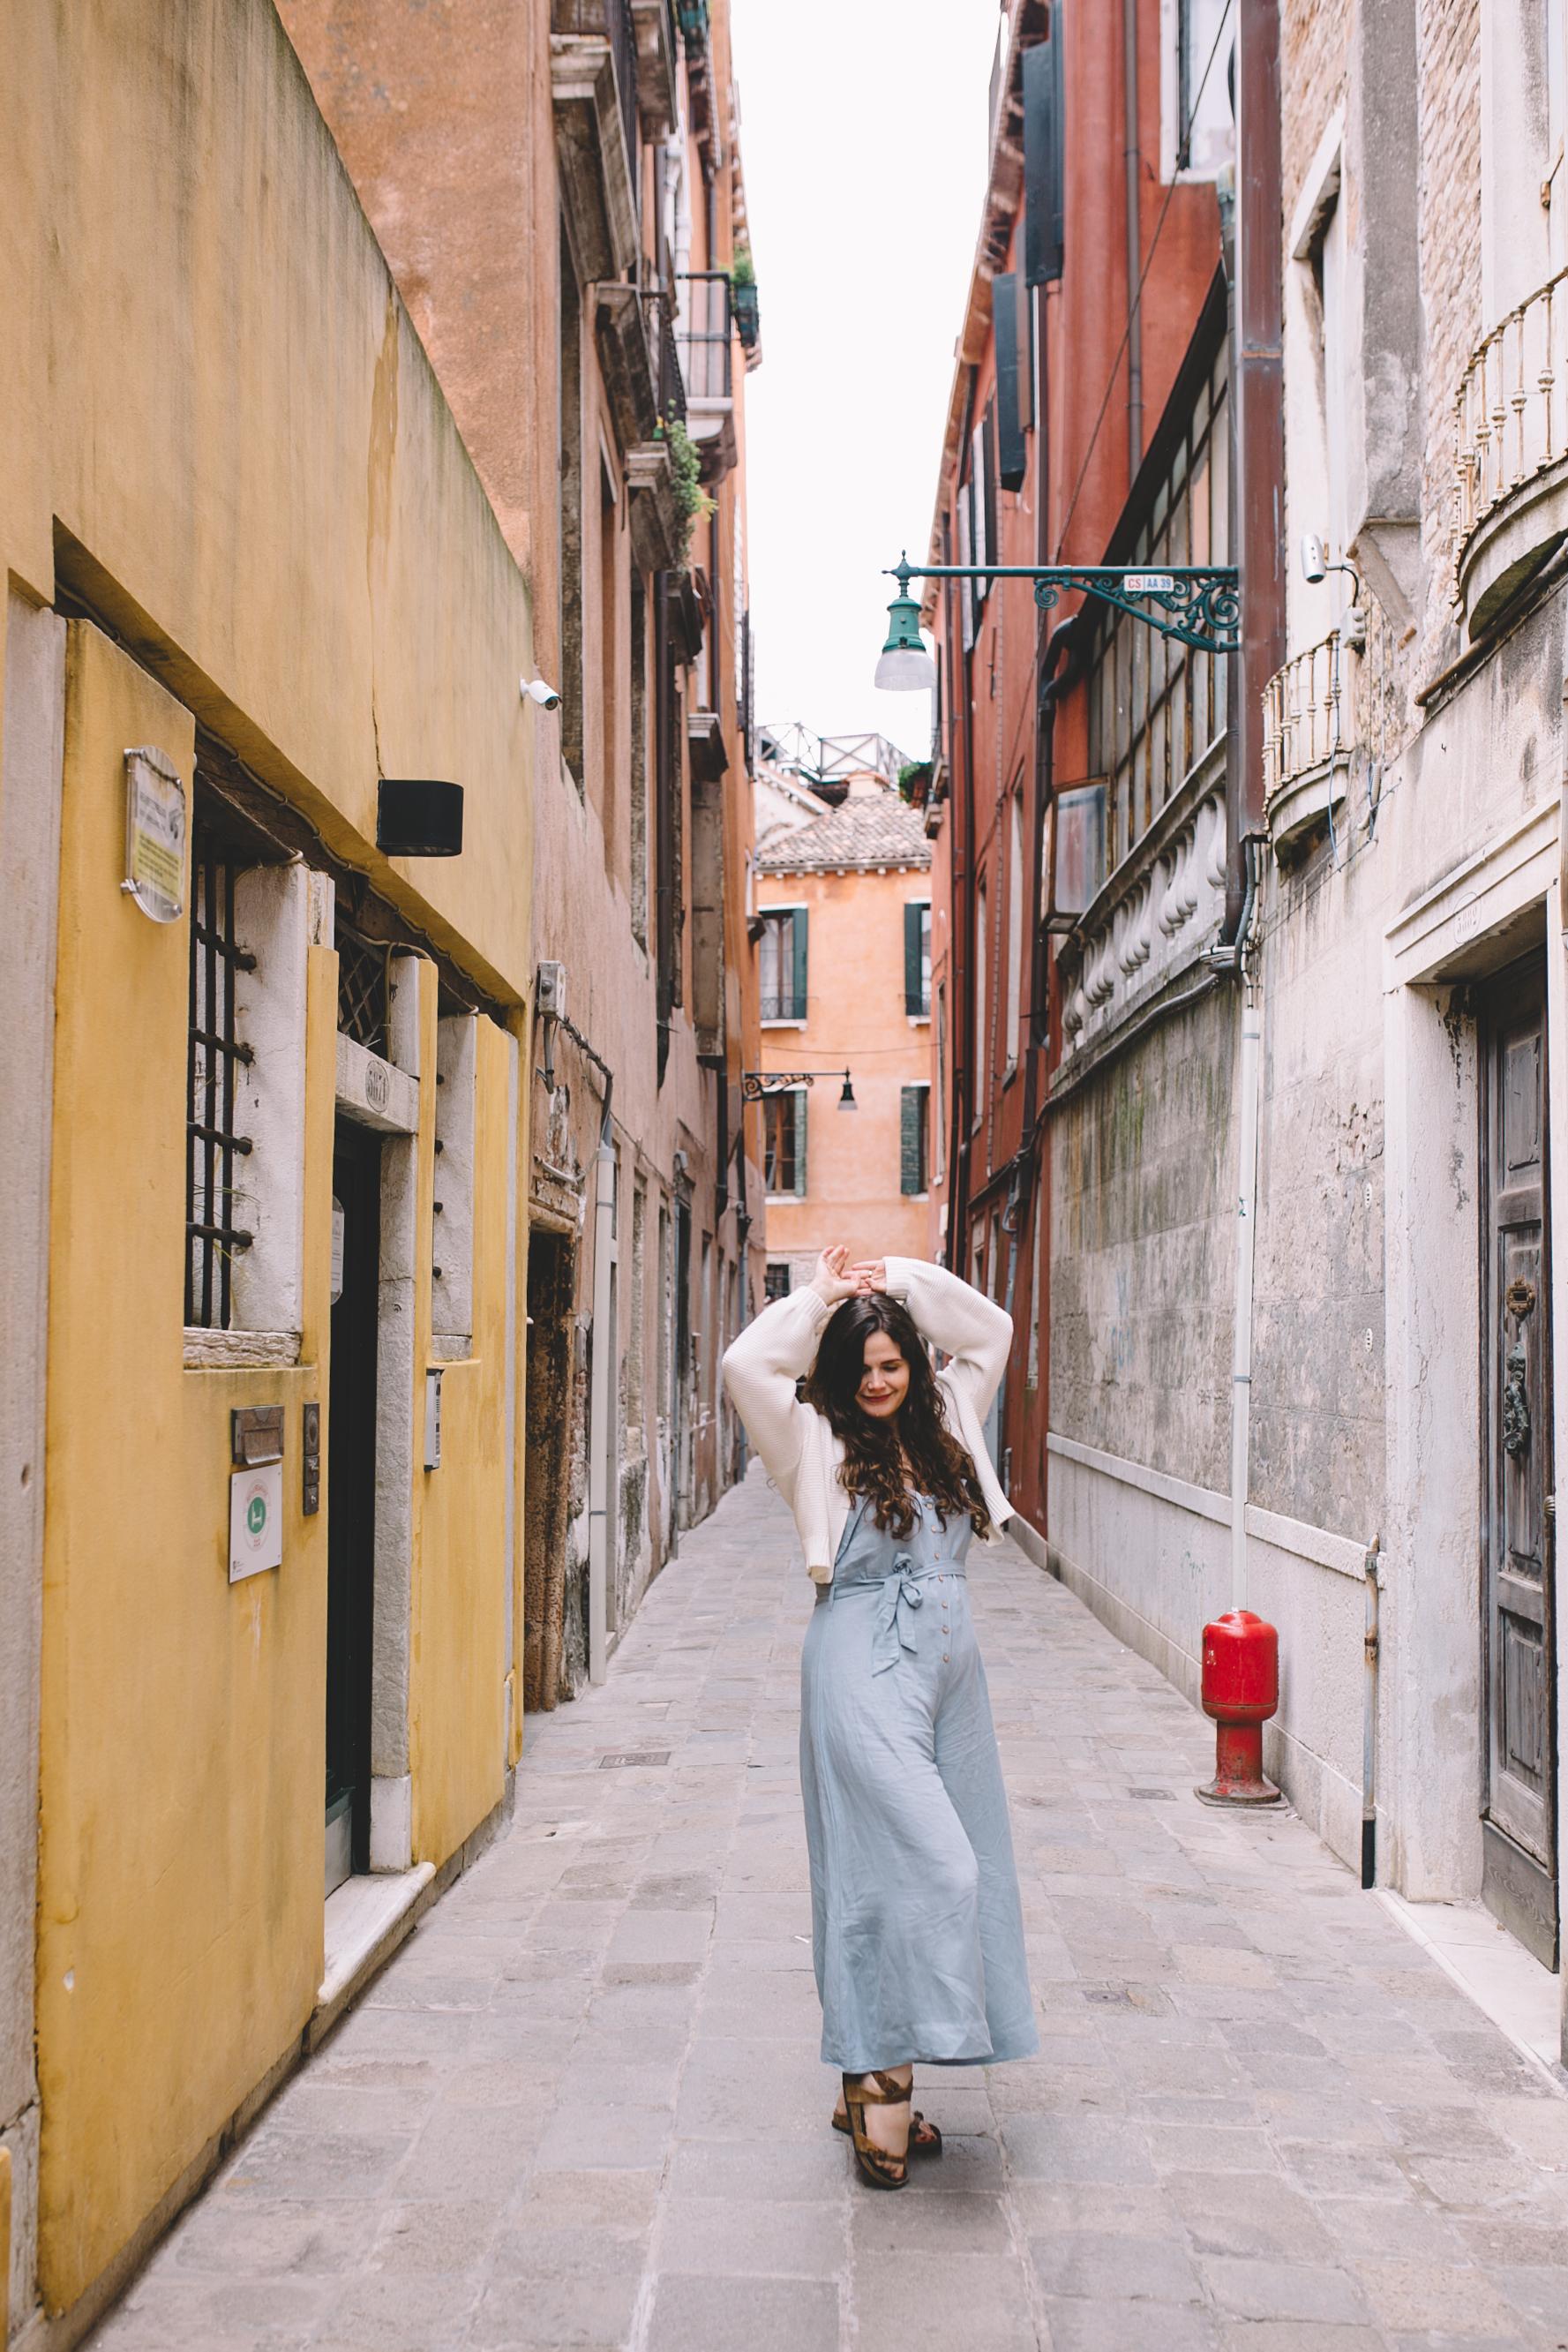 Blog Venice Italy Streets  (5 of 6).jpg